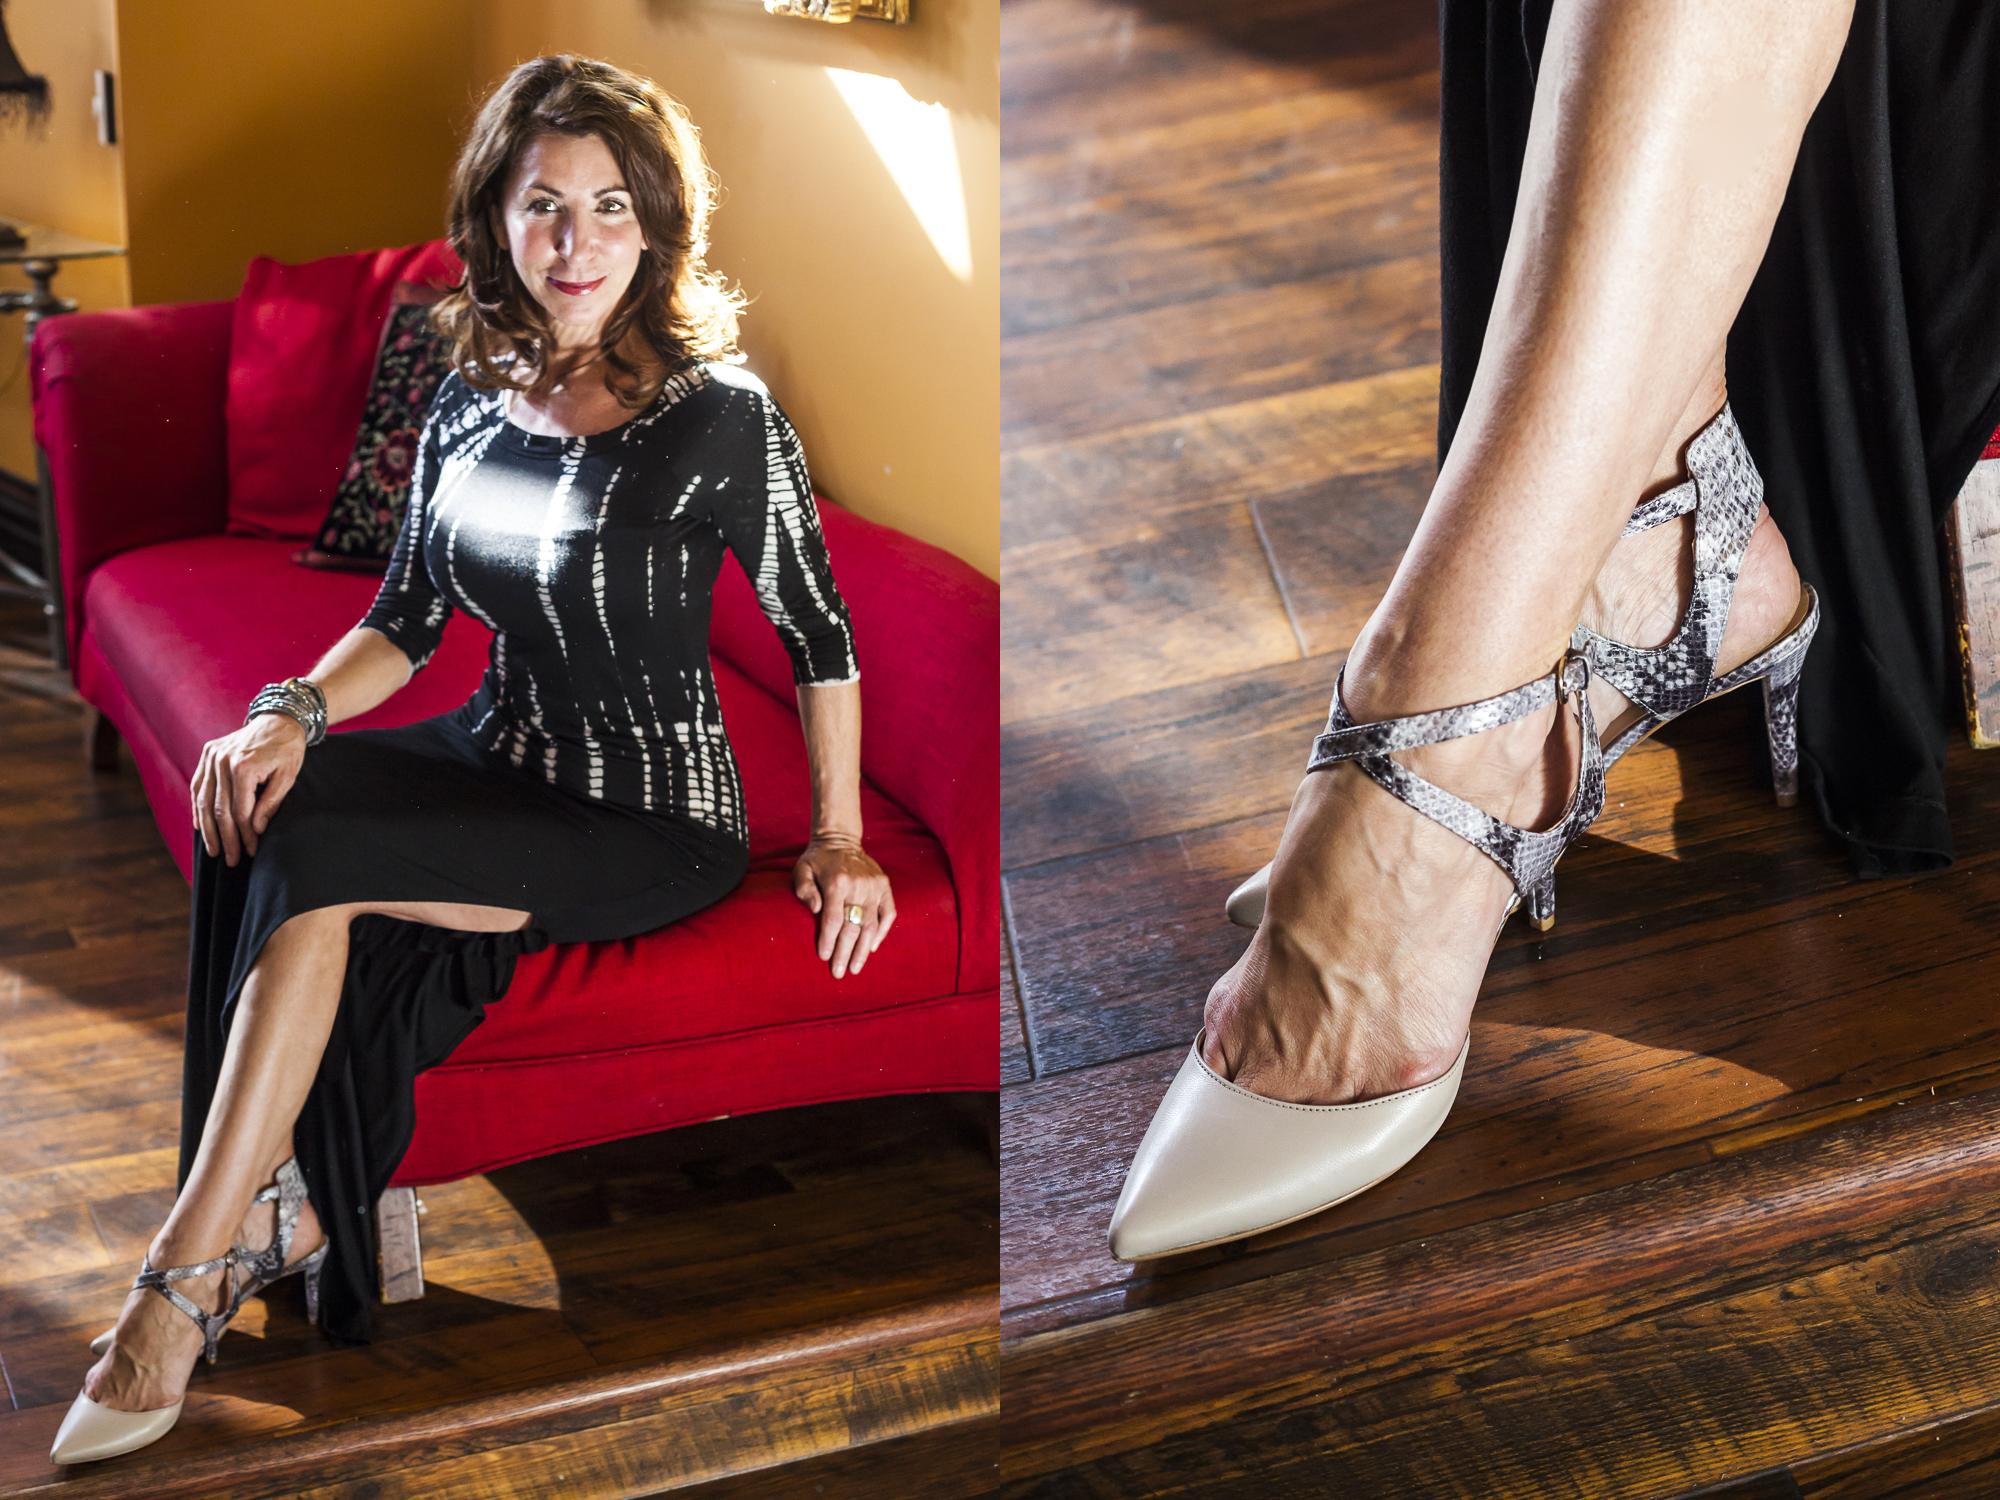 St-albert-womens-fashion-boutique-bella-maas-spring-2015